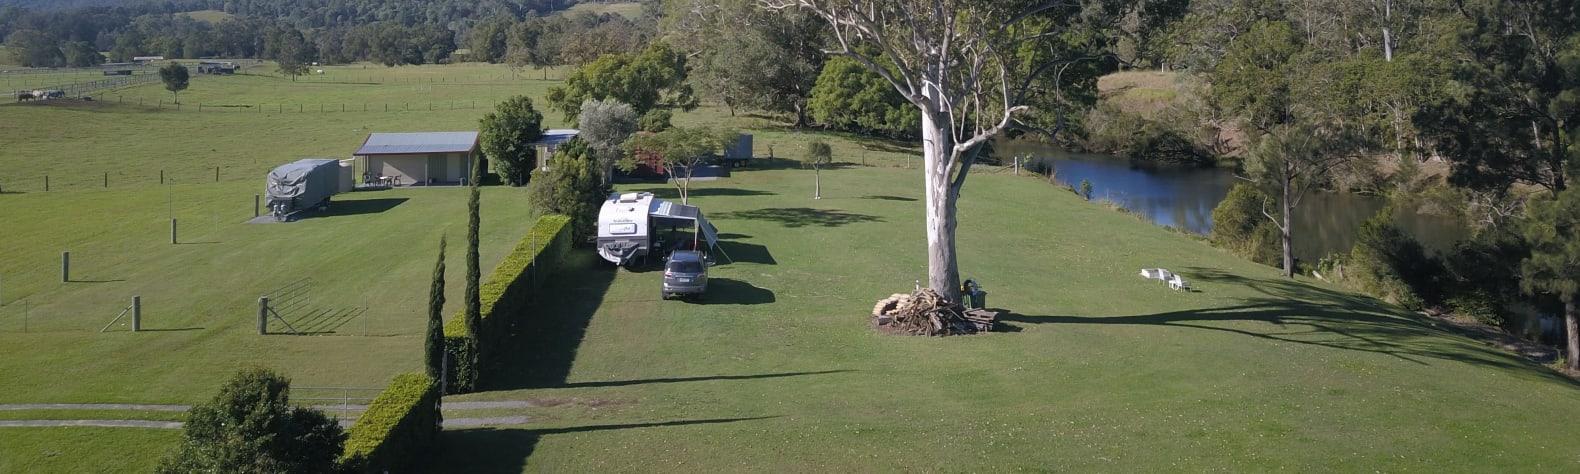 River Park Camping Gold Coast